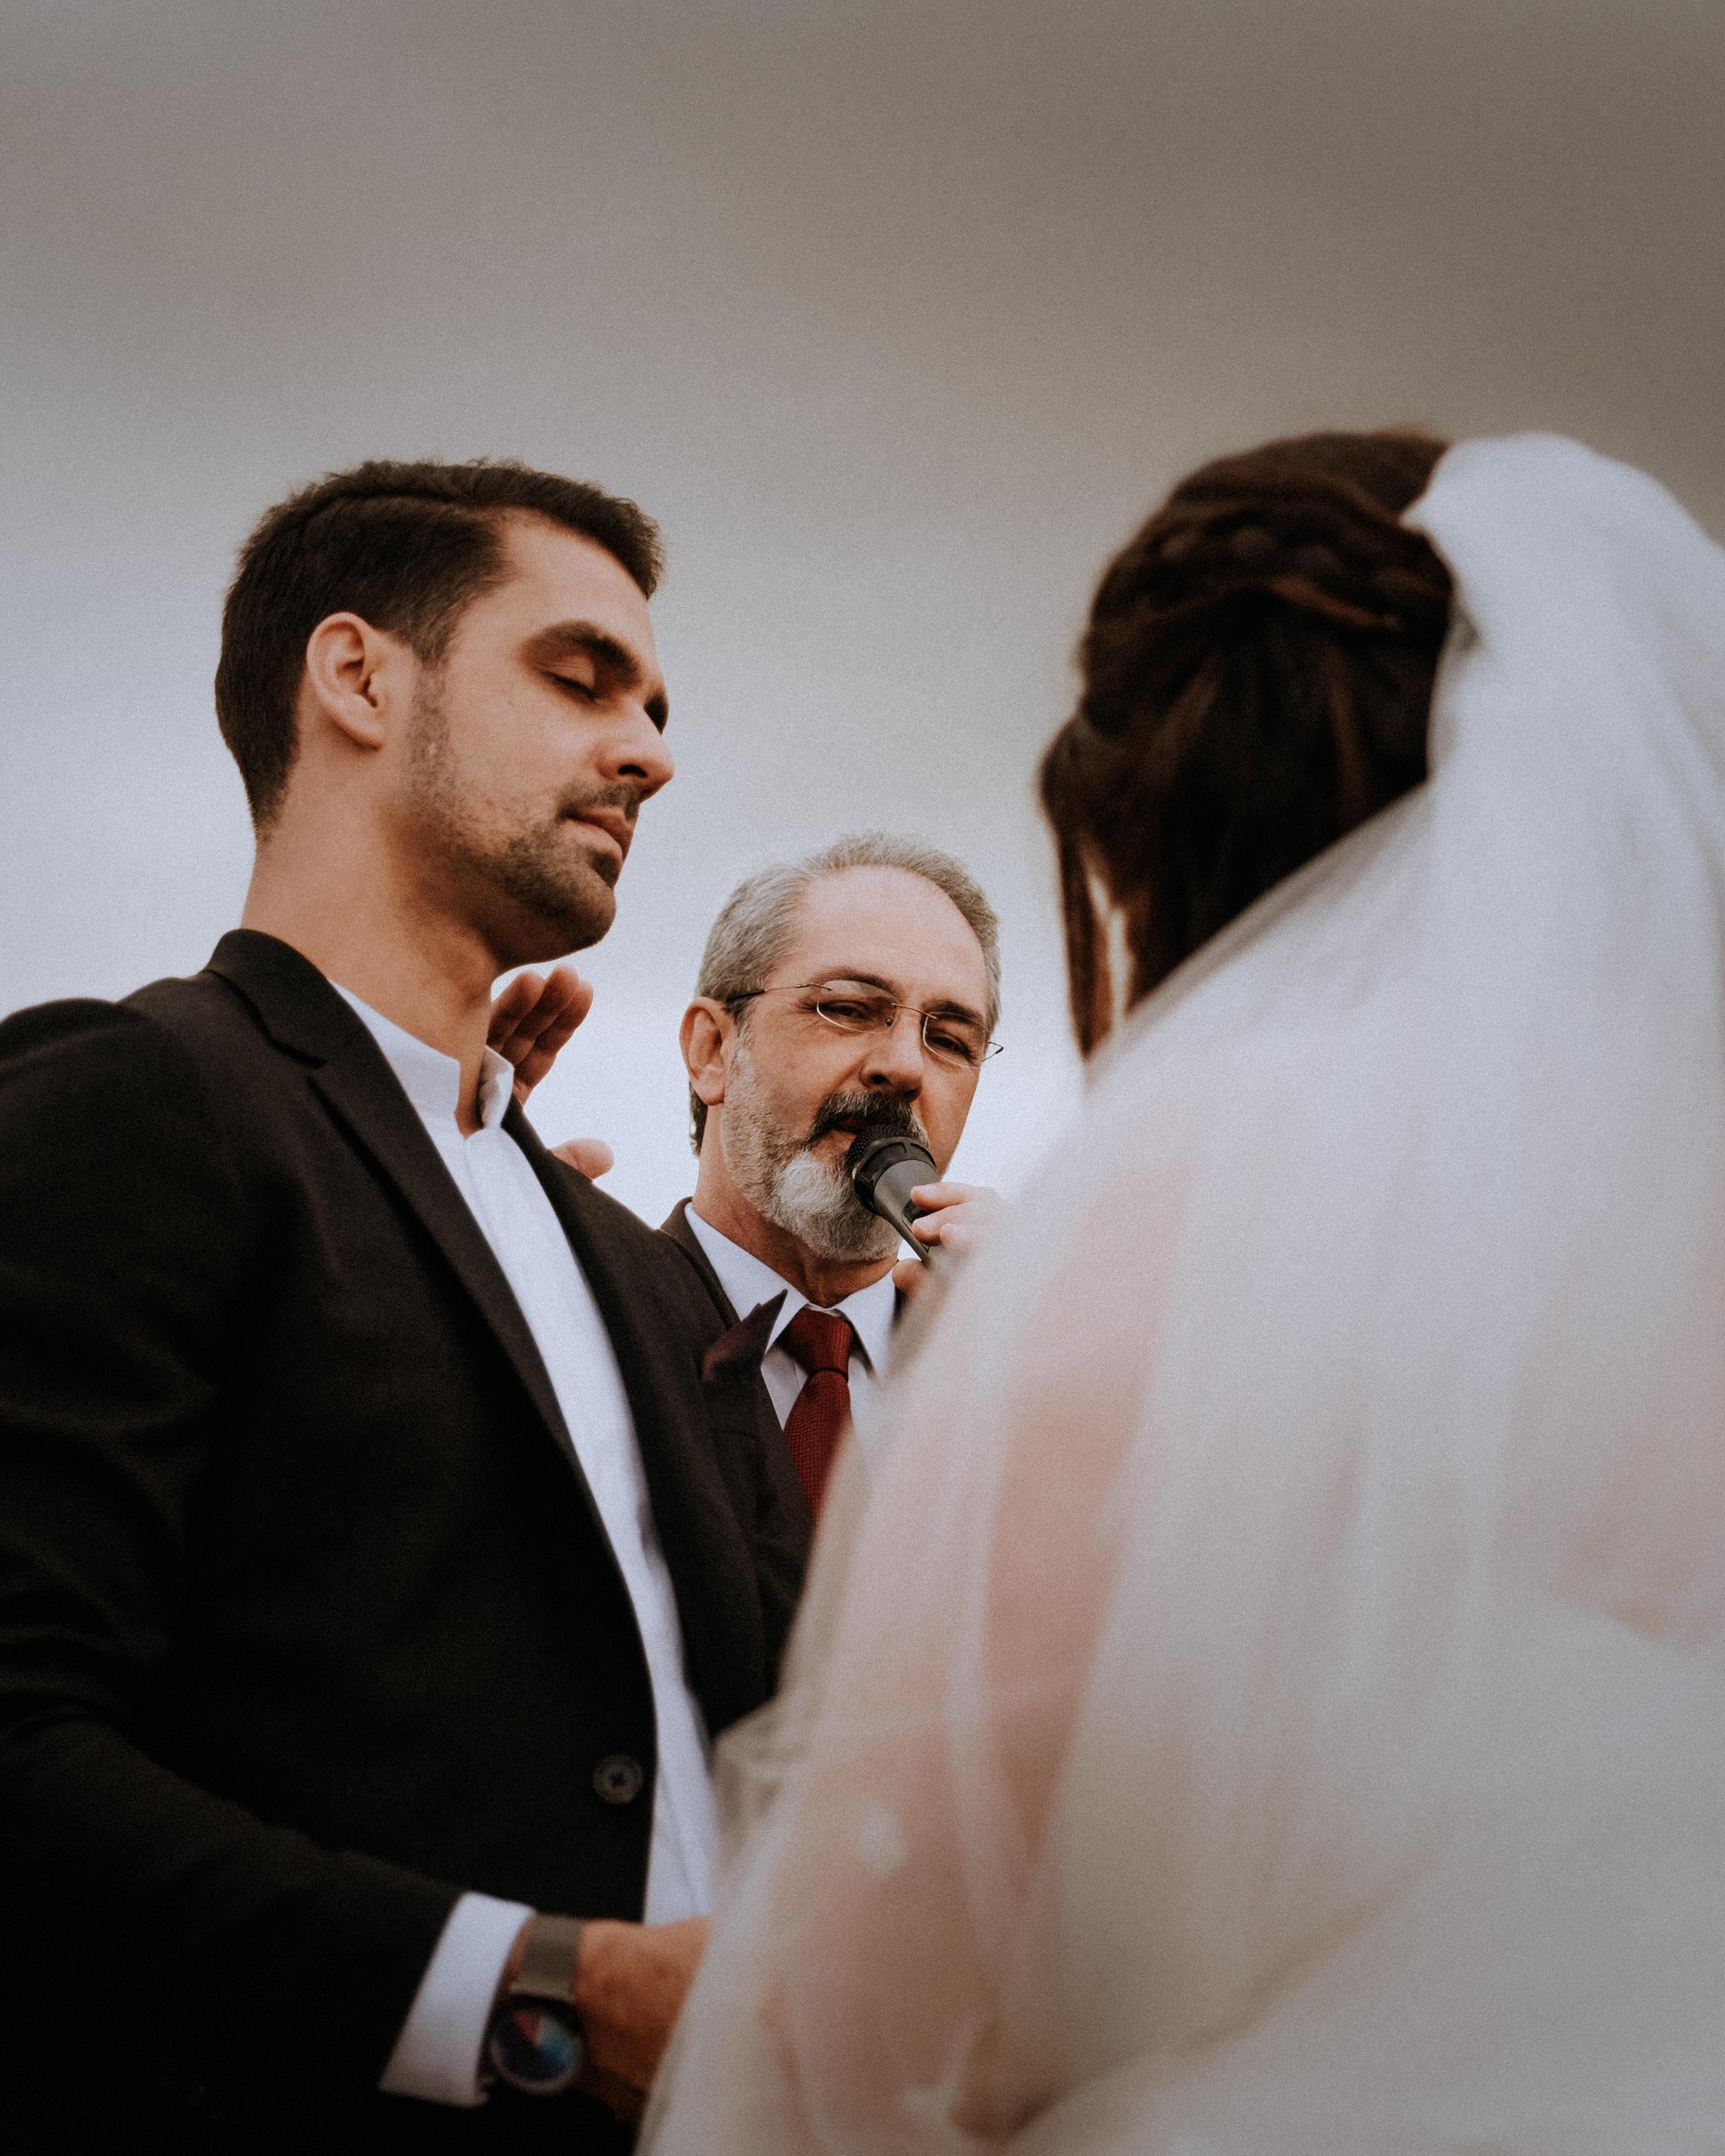 s+j_top_elopement wedding photography_kings & thieves_blog - 261.jpg